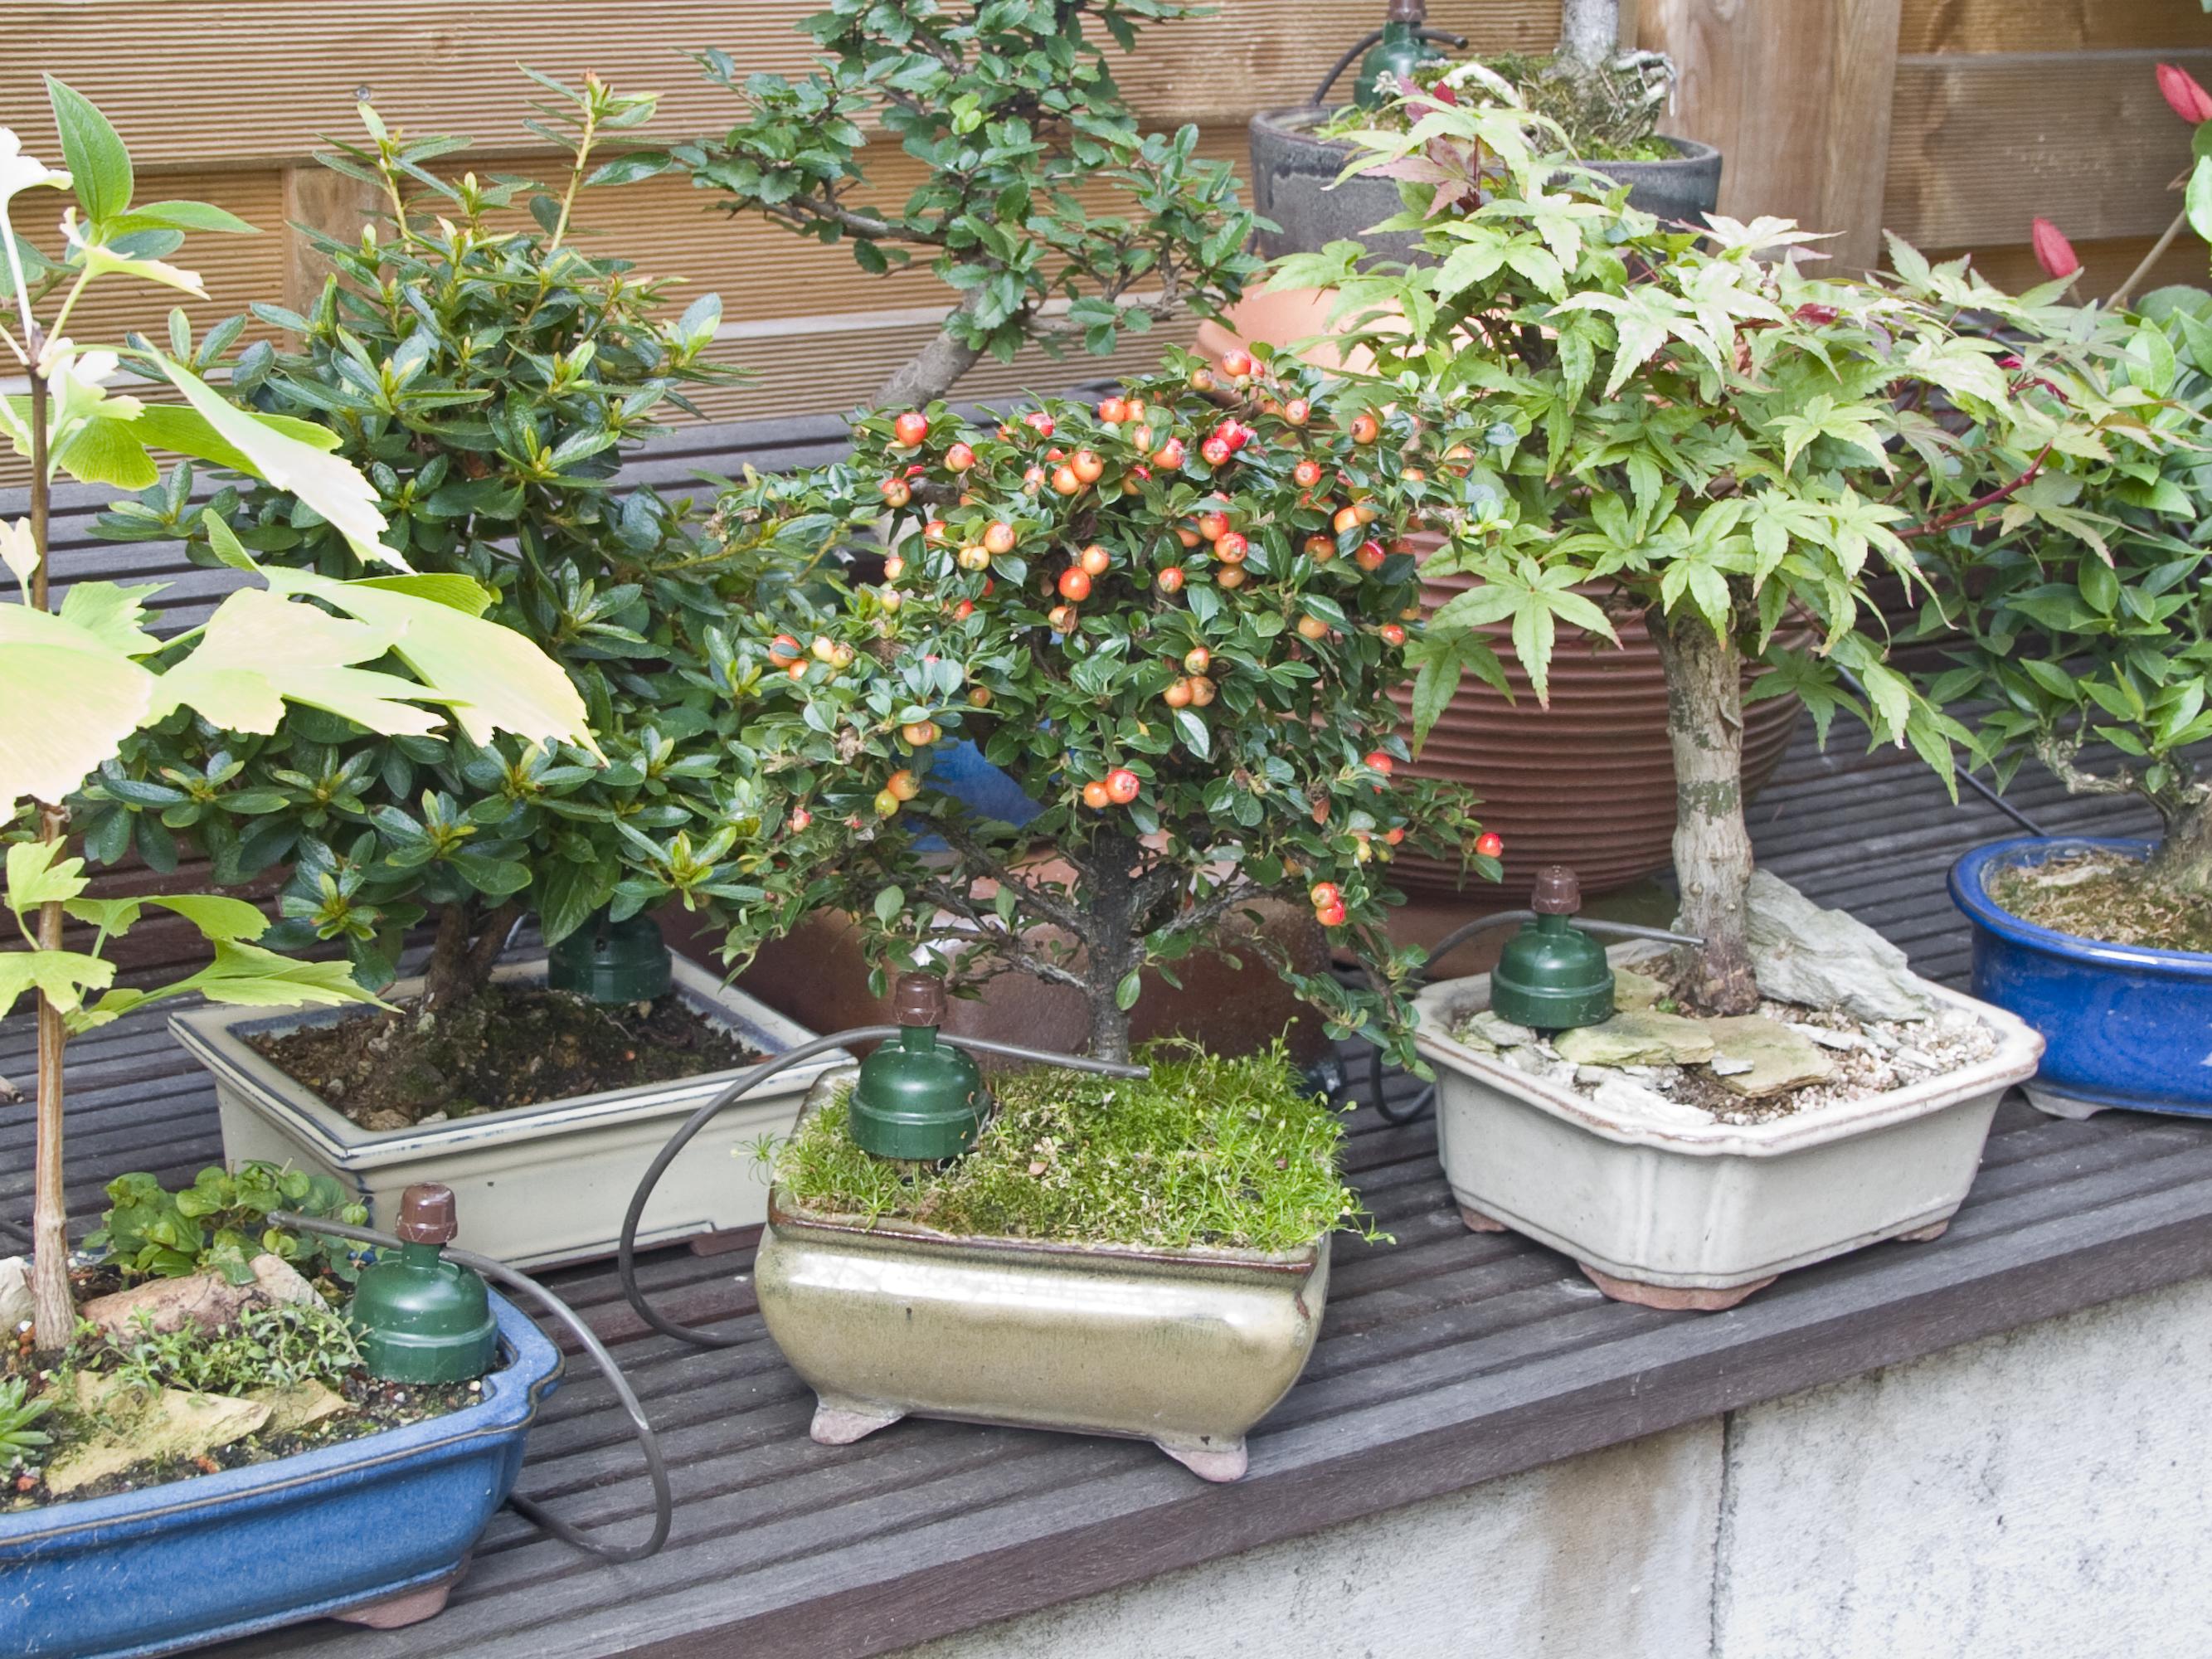 tropf blumat bonsai bambach gbr blumat shop. Black Bedroom Furniture Sets. Home Design Ideas